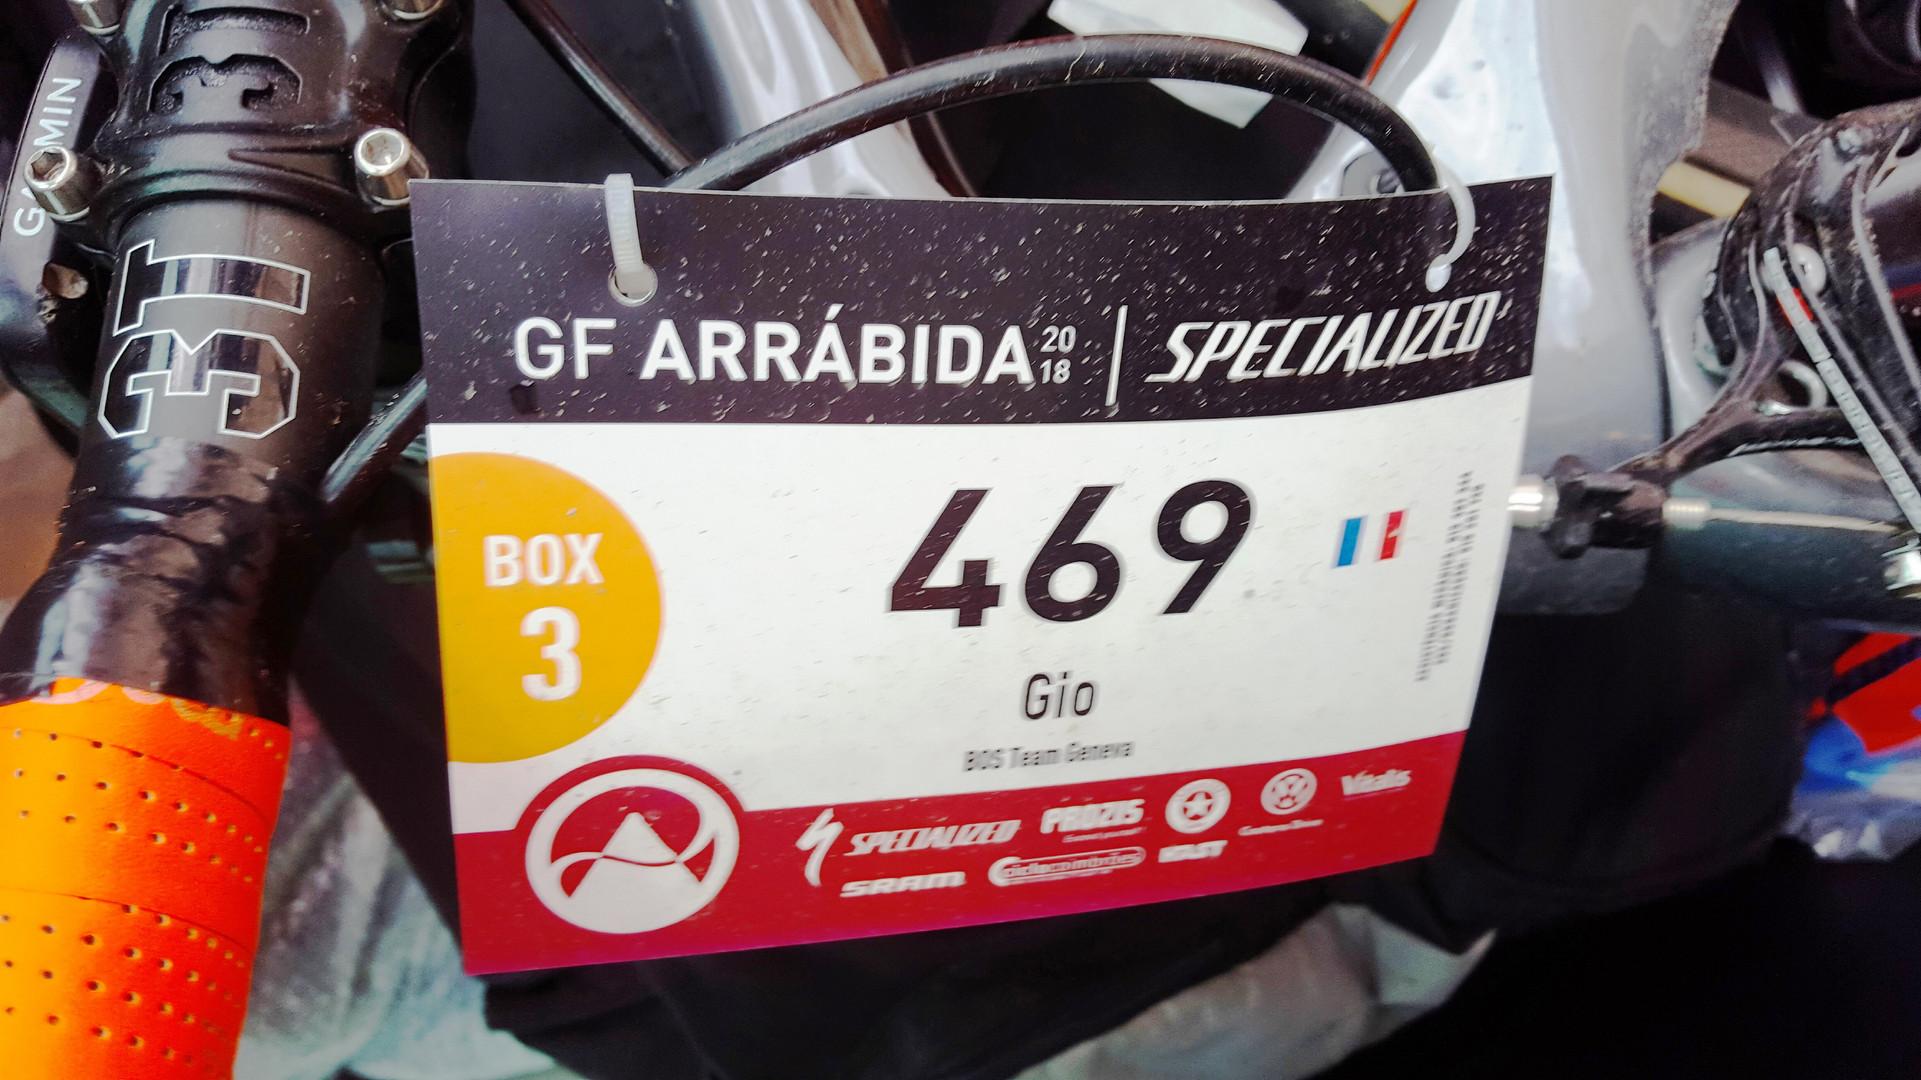 bike-tours-algarve-arrabida_4.jpg